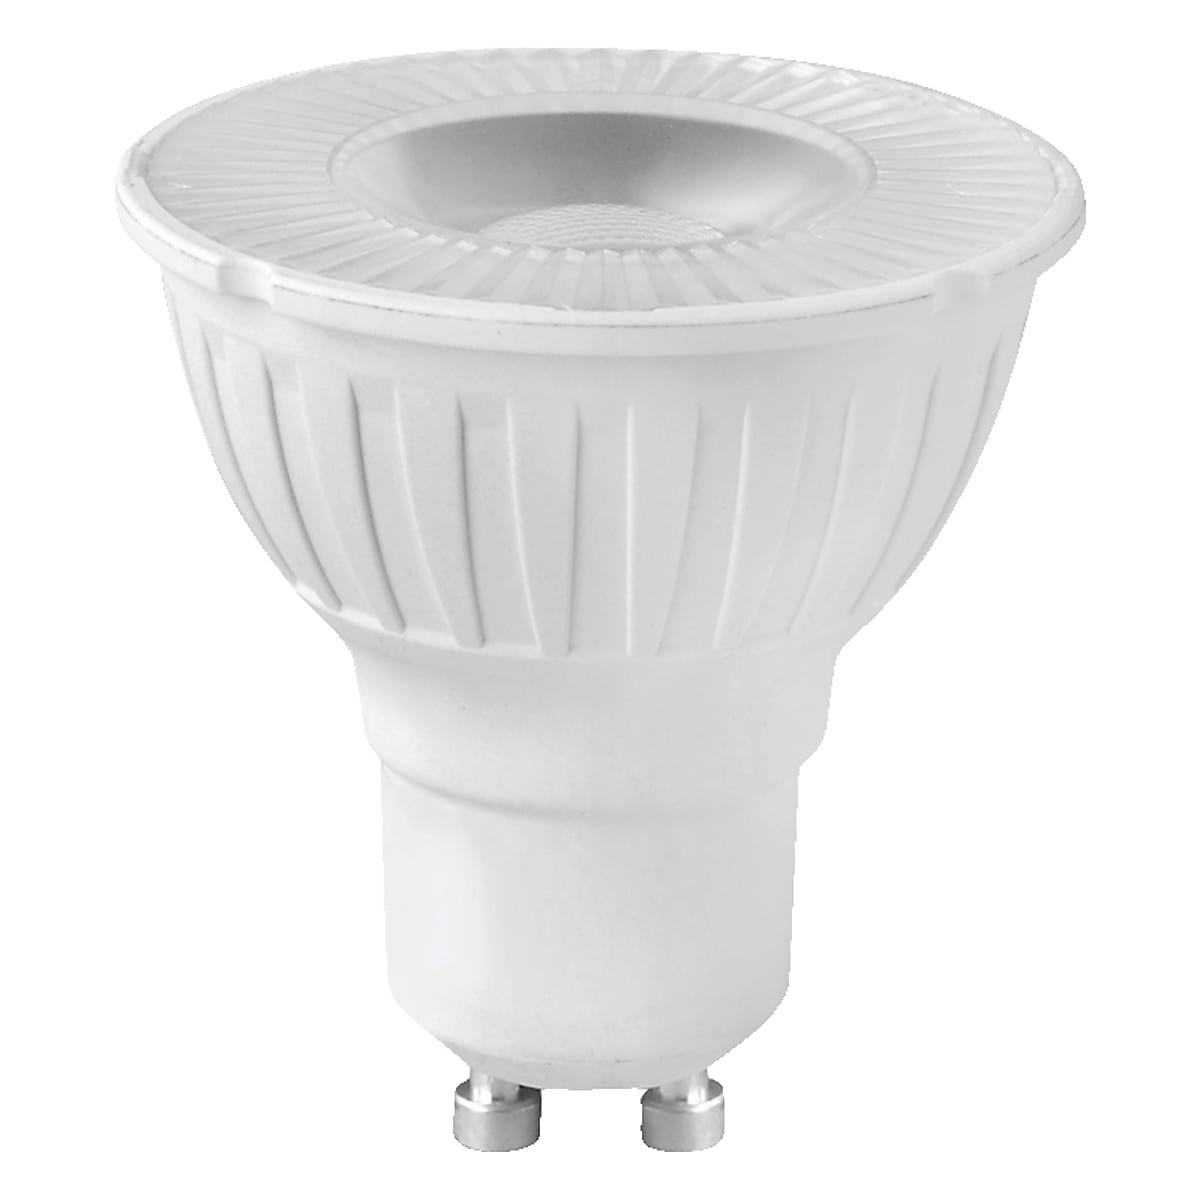 LED-lampa GU10 Clas Ohlson 2-pack